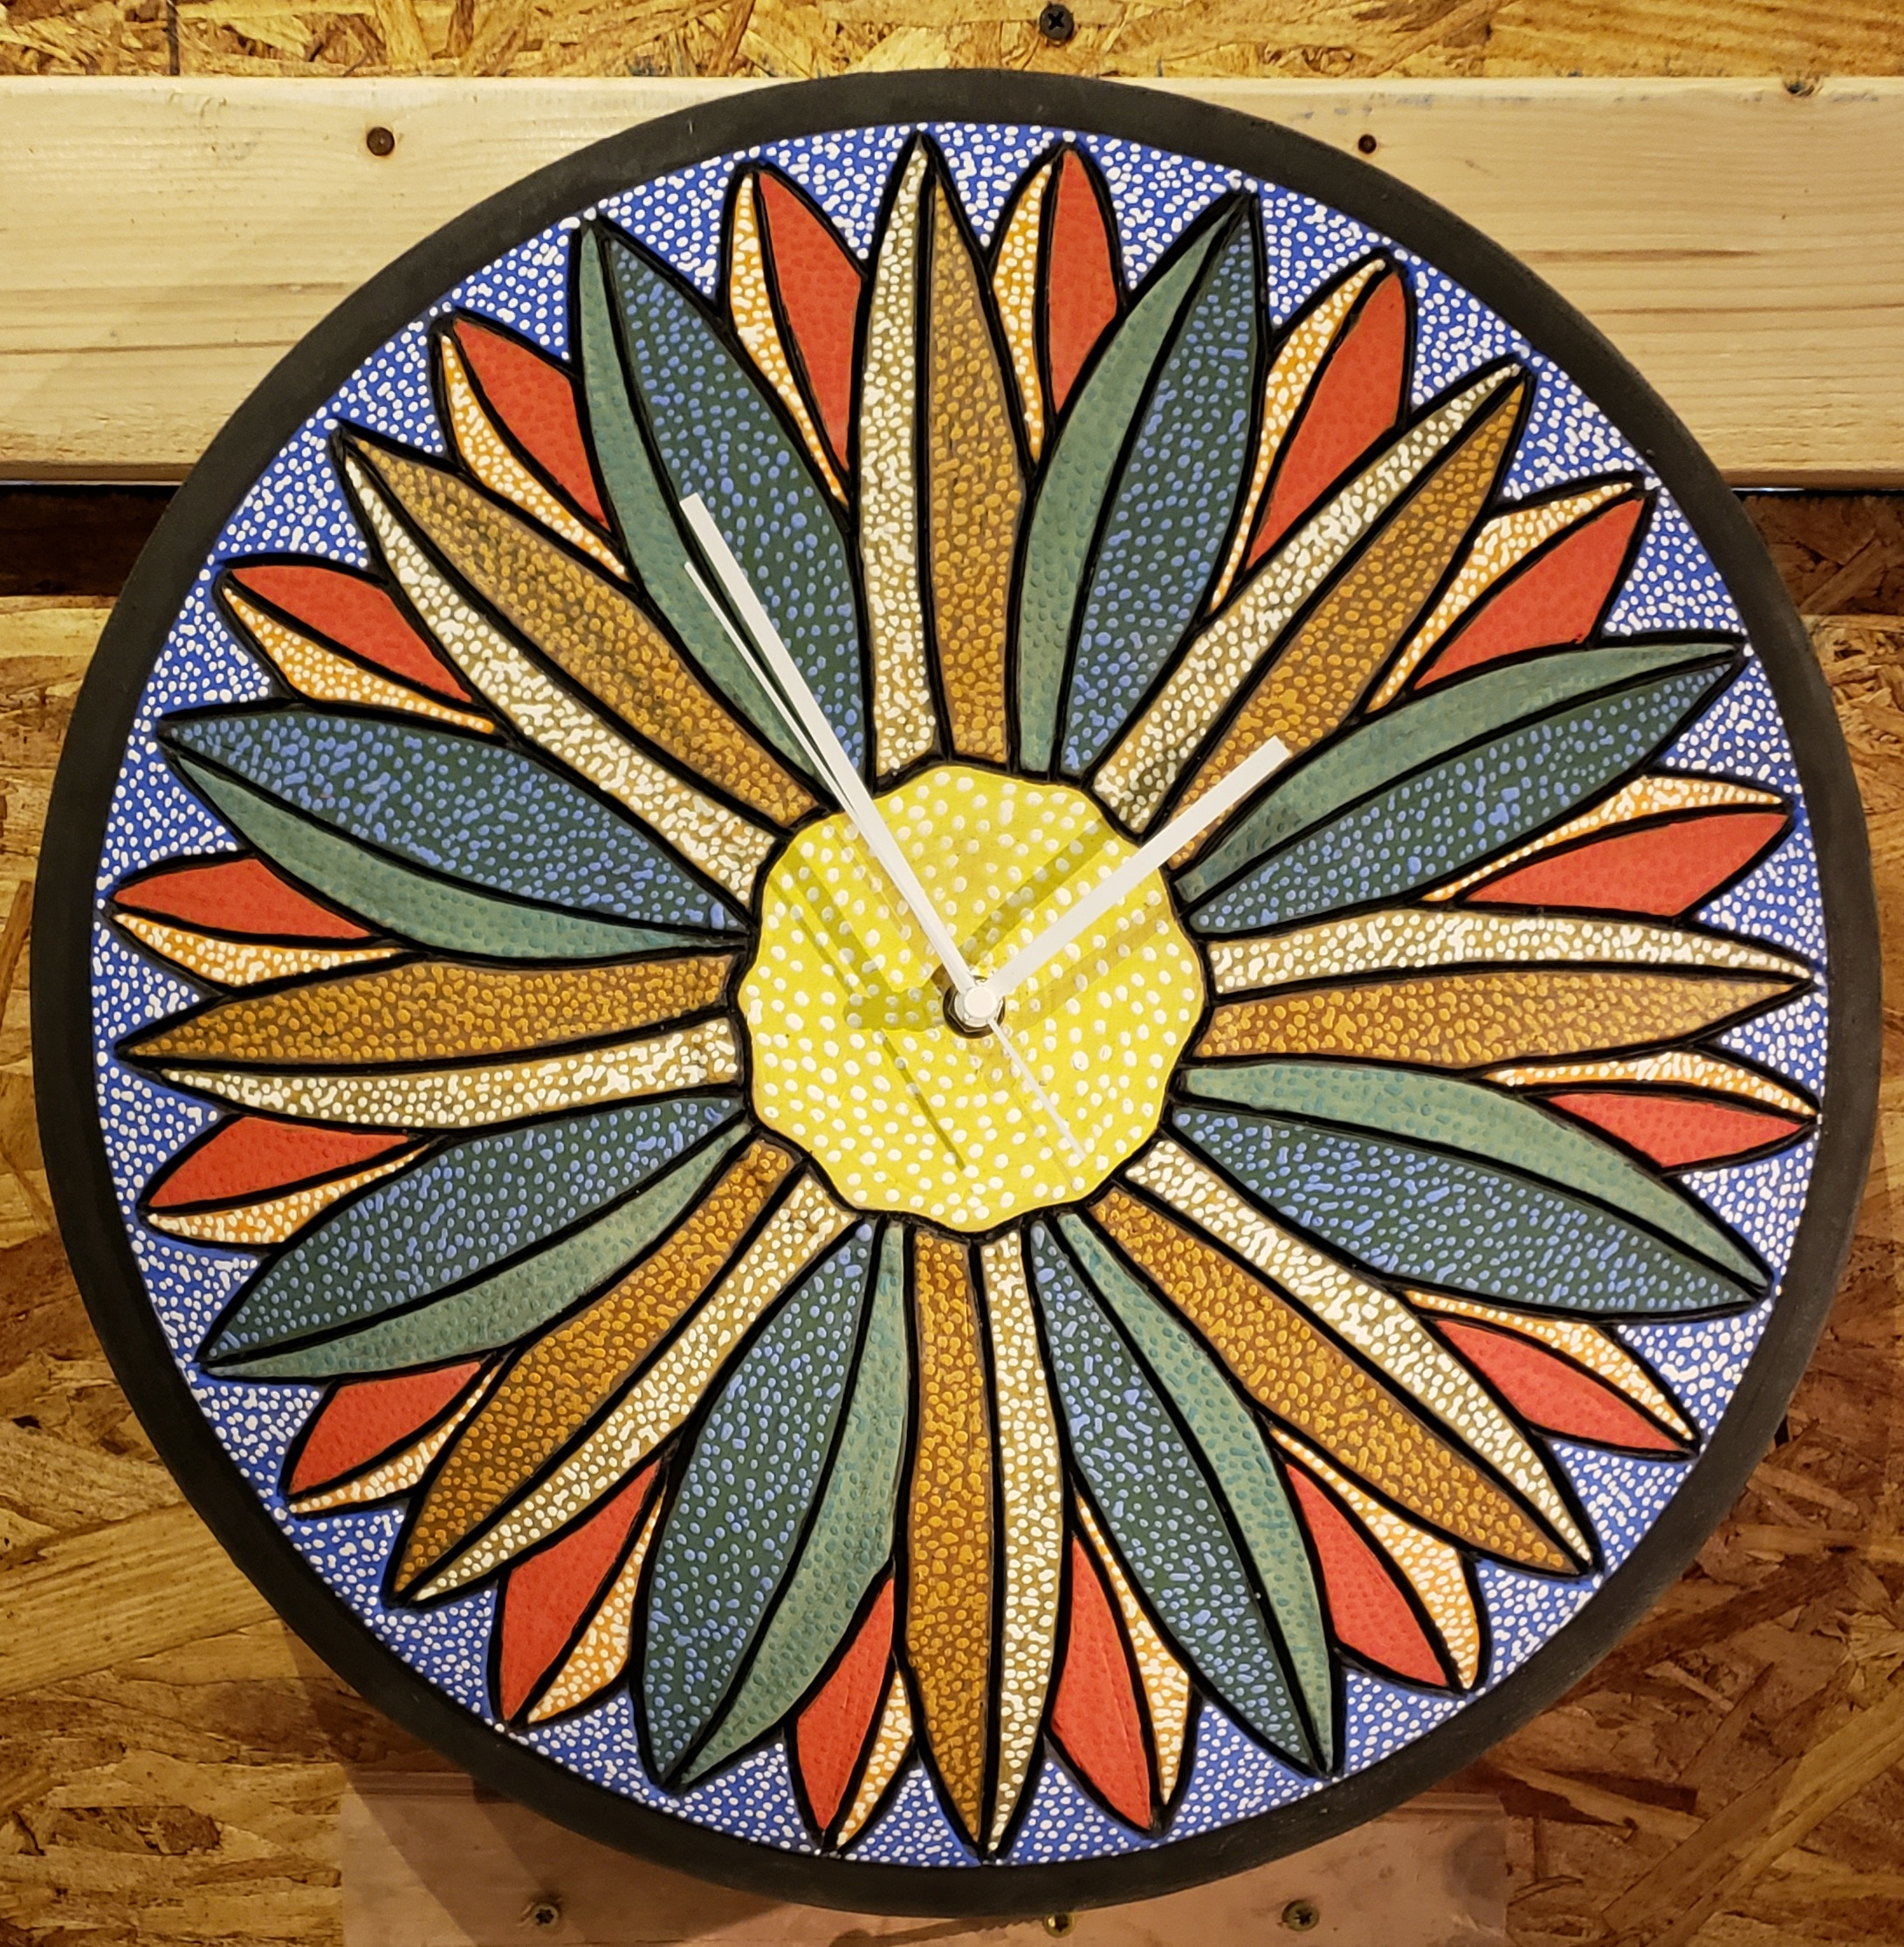 17.5 inch diameter x 1